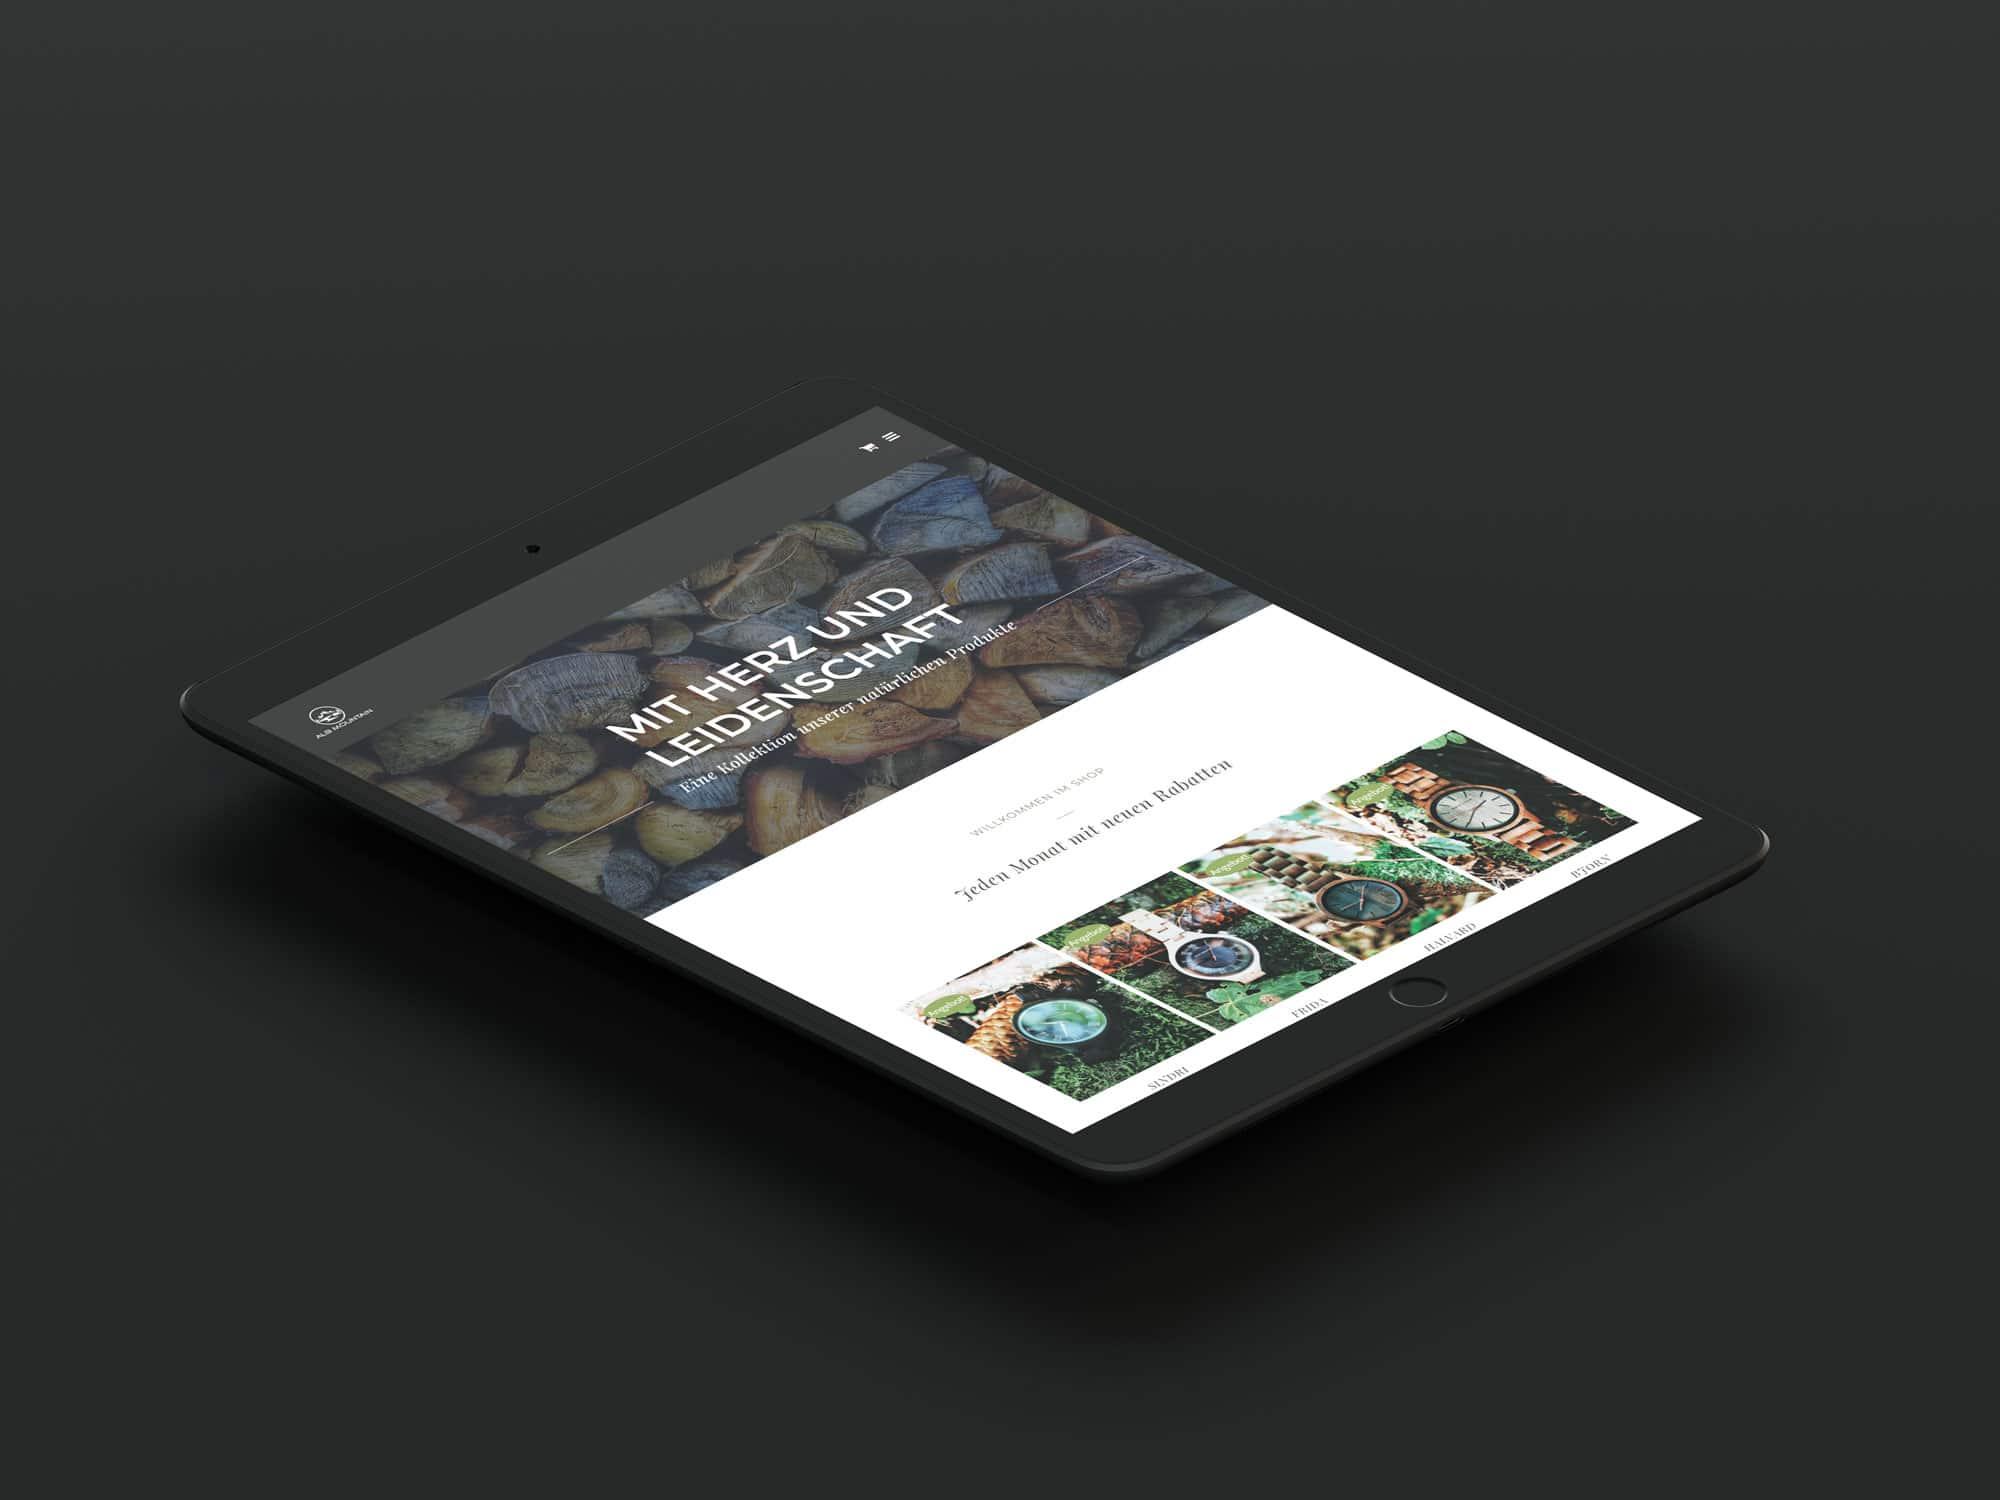 liebespixel-agentur-alb-mountain-tablet-webseite-mockup